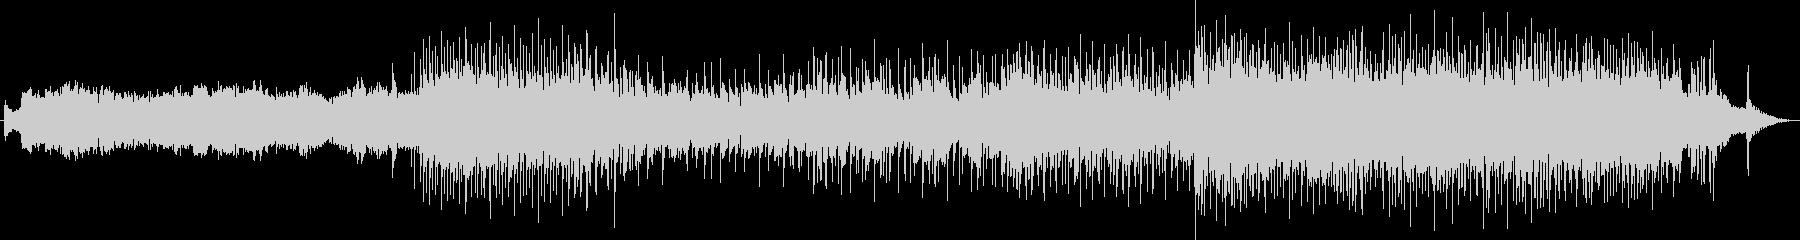 XJapanのようなタイプのハードロックの未再生の波形